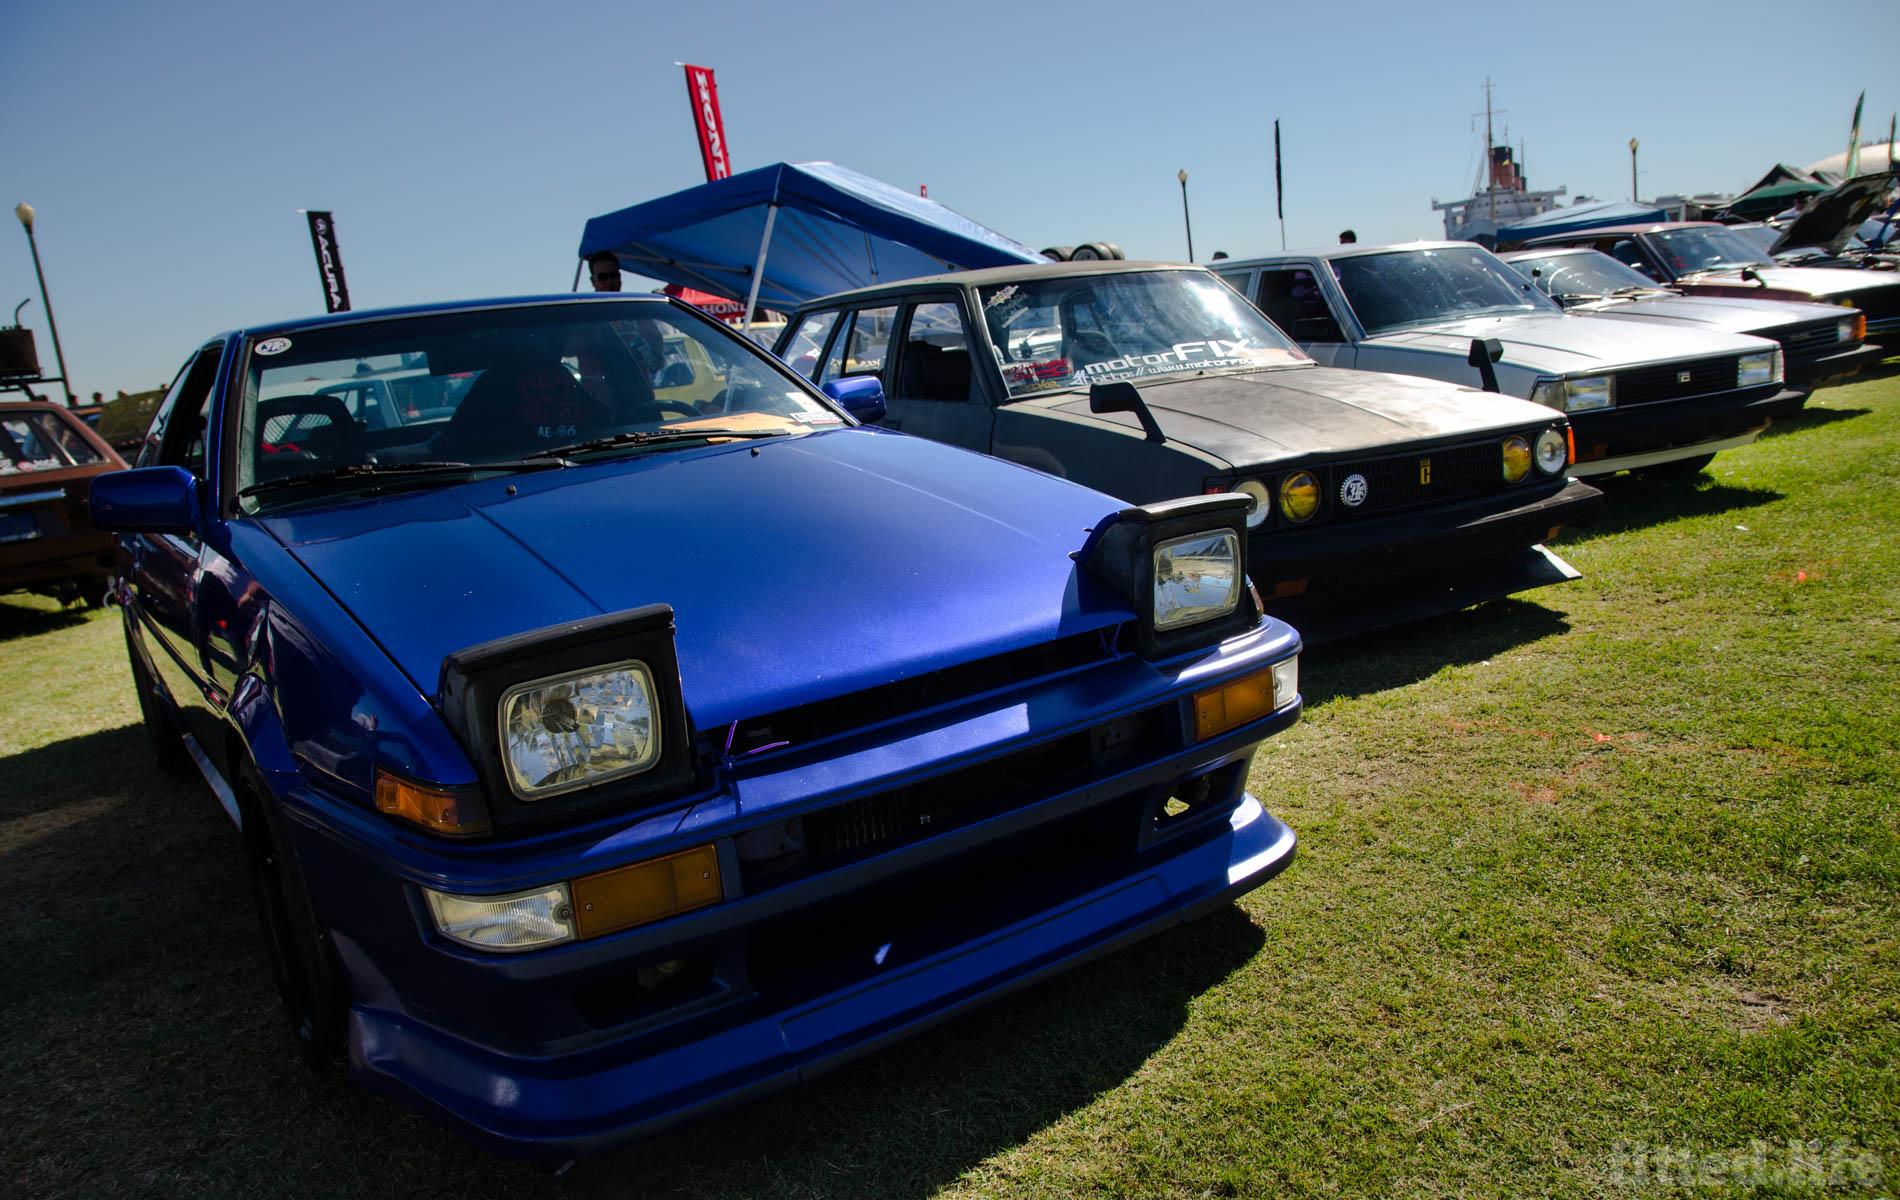 chasing-classics-at-jccs-2013-fittedlife13.jpg